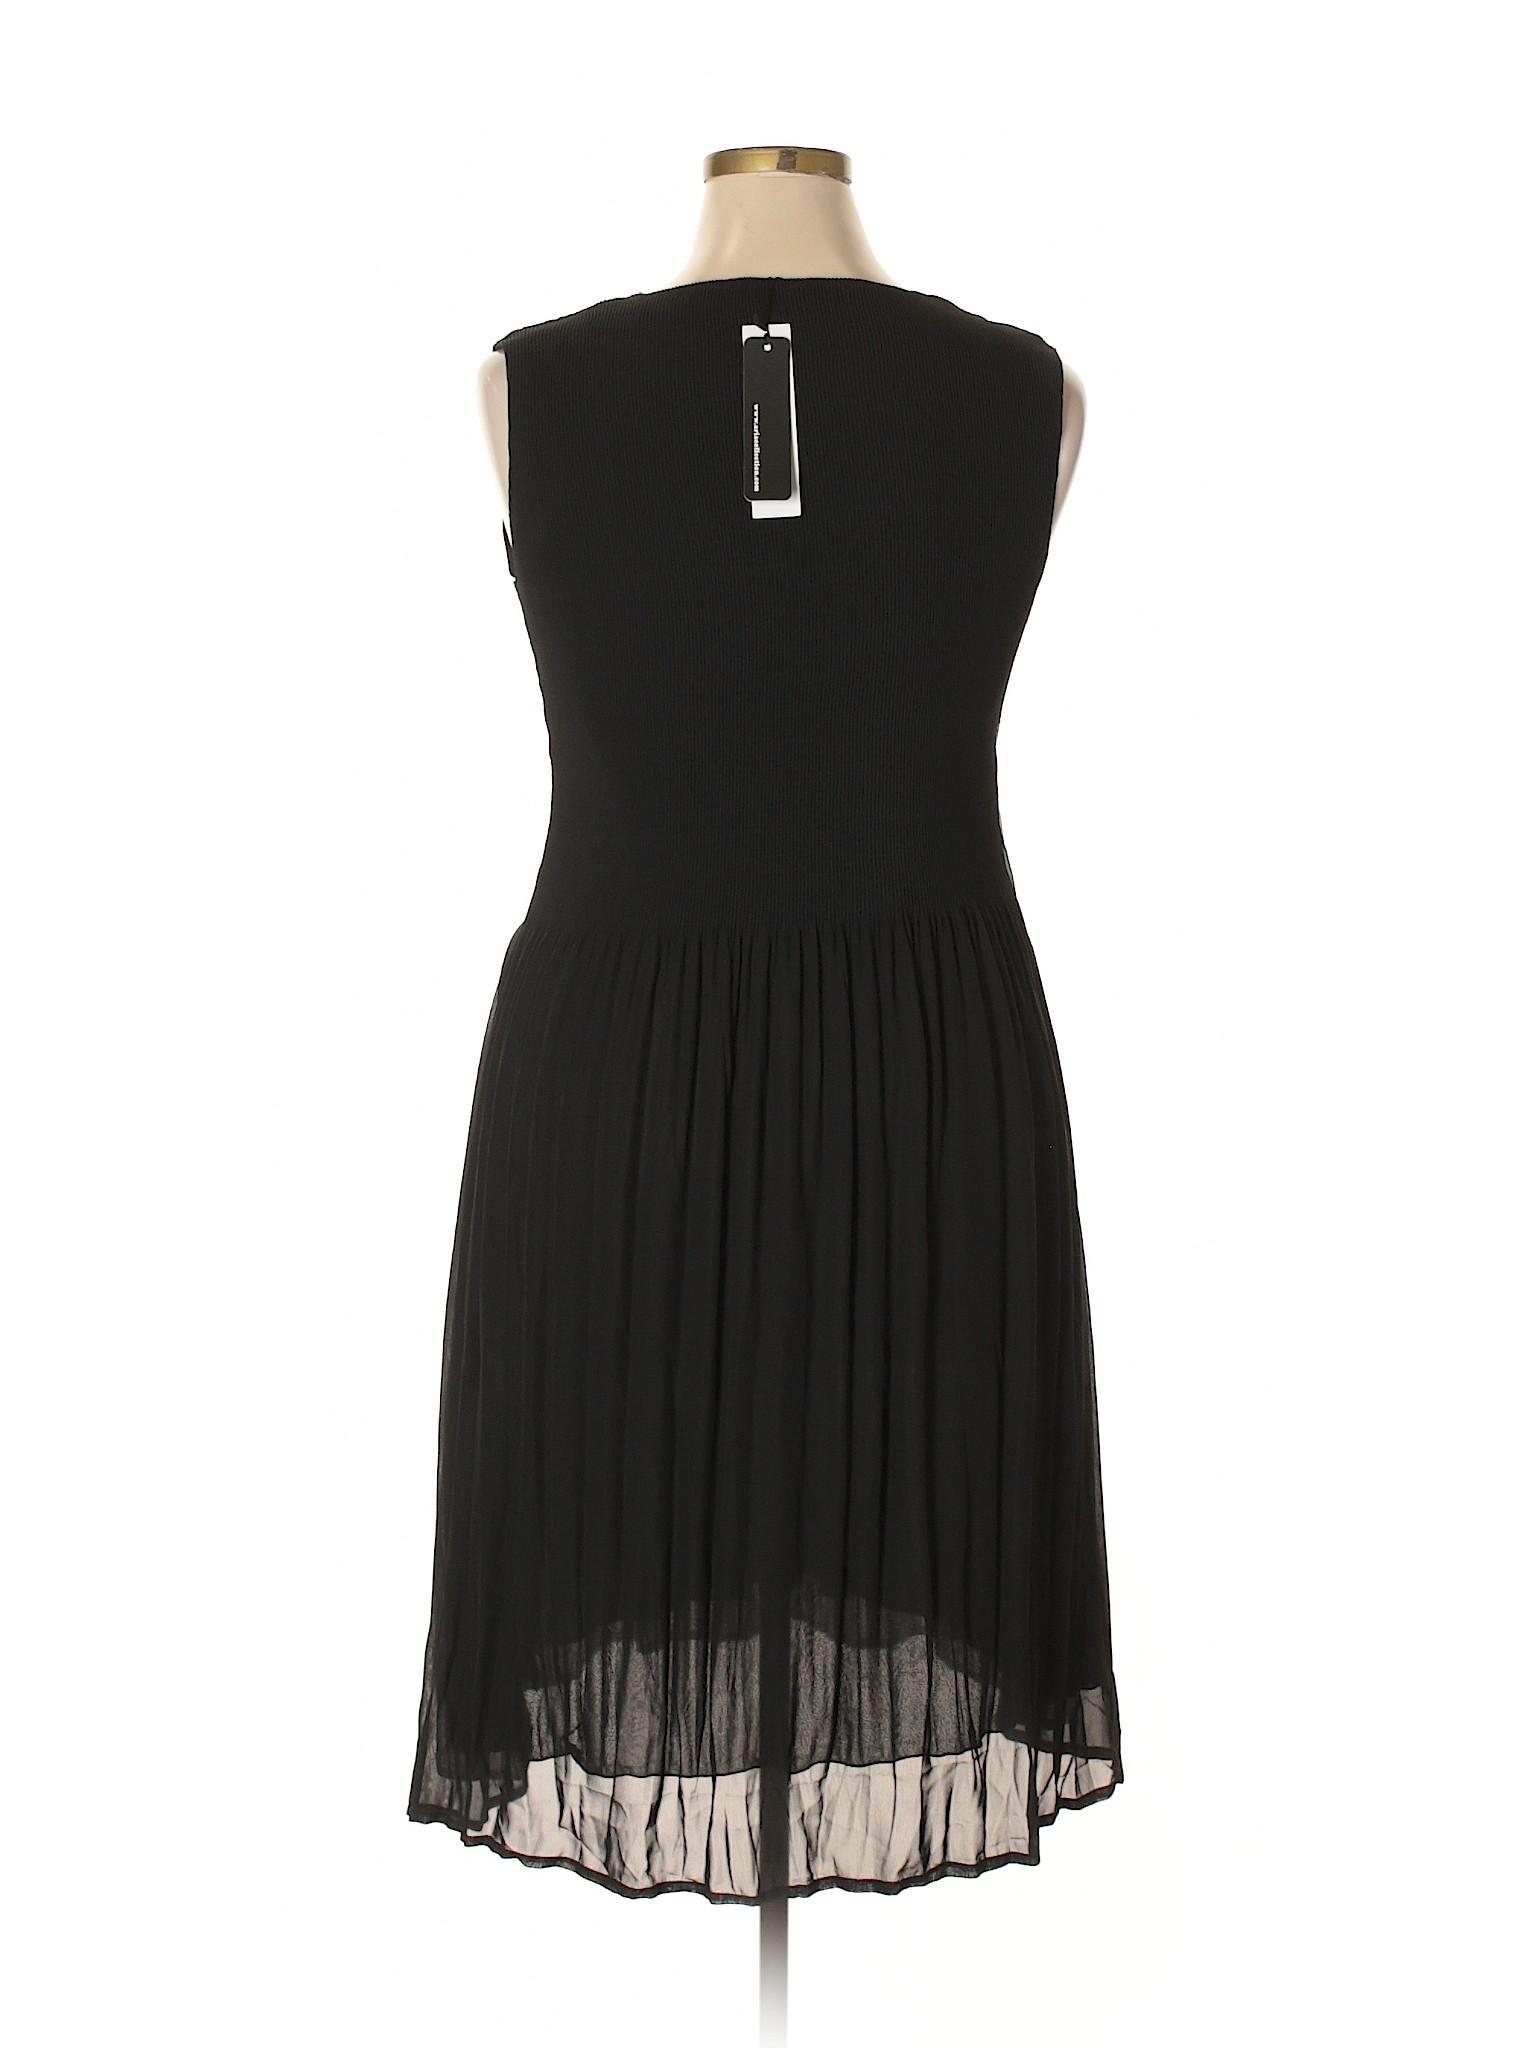 Lindi winter winter Boutique Dress Casual Dress Casual Boutique Lindi n6AwqYvx